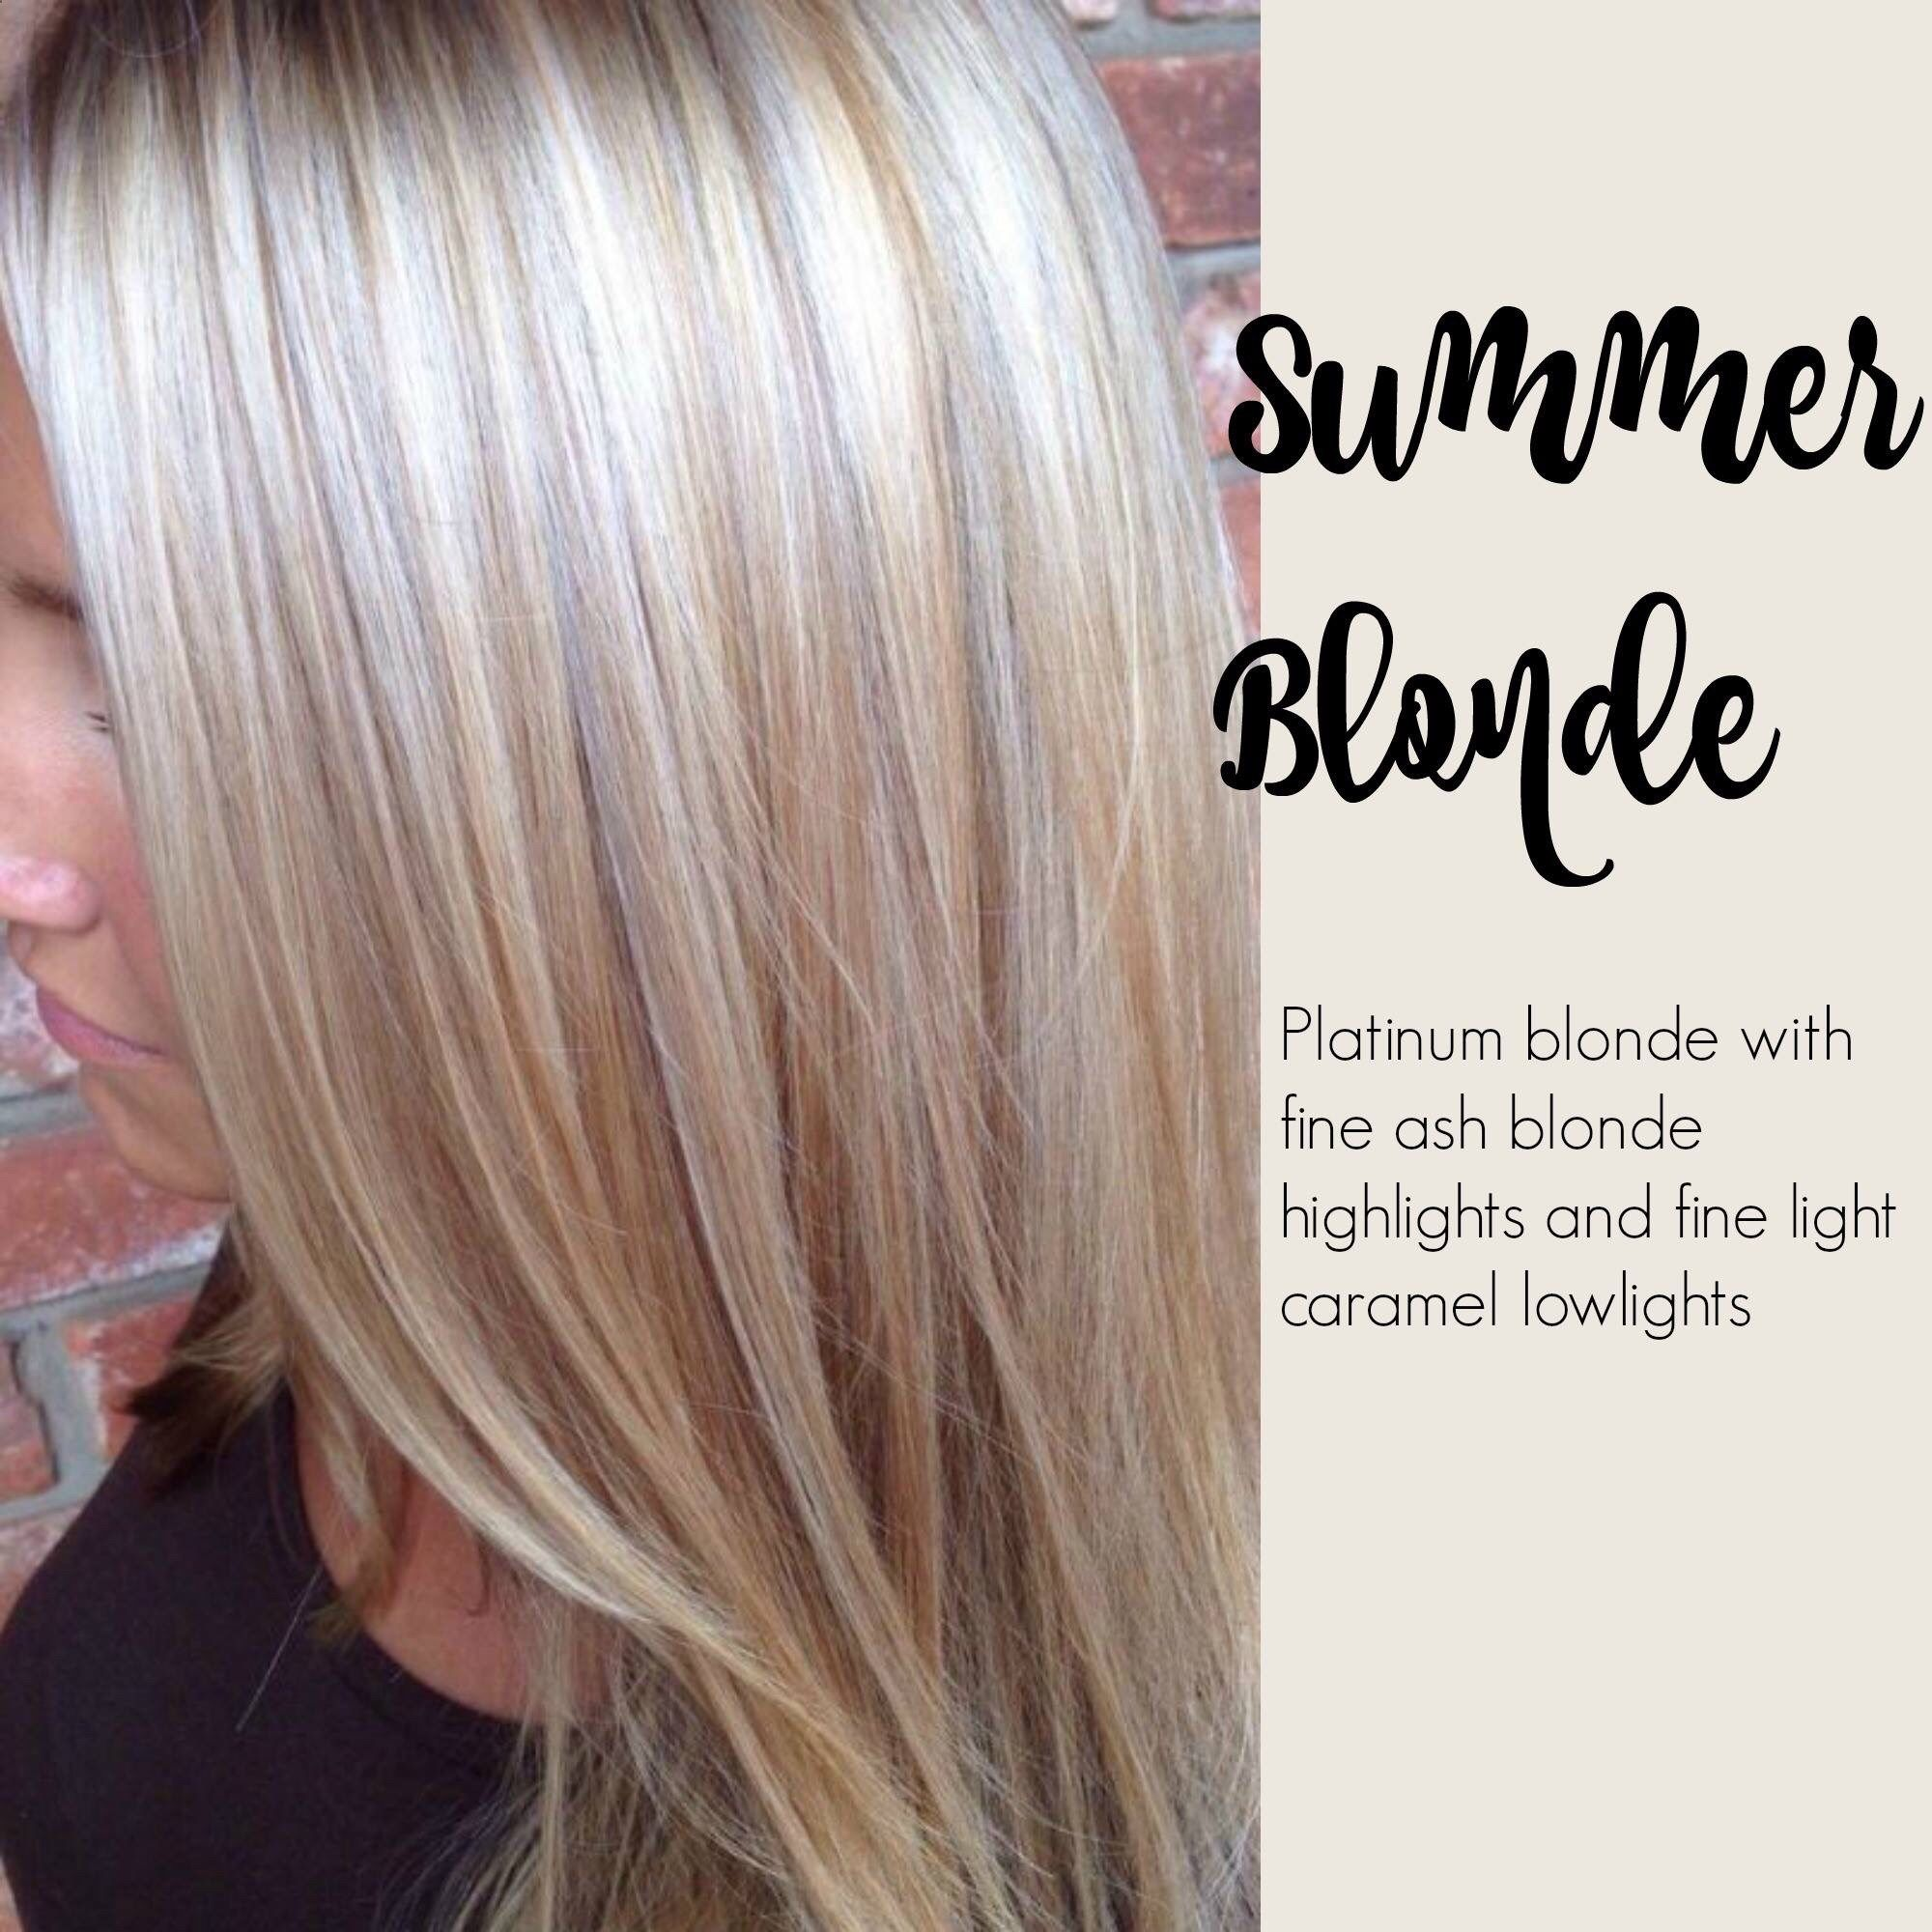 Summer blonde Platinum blonde with fine ash blond highlights and